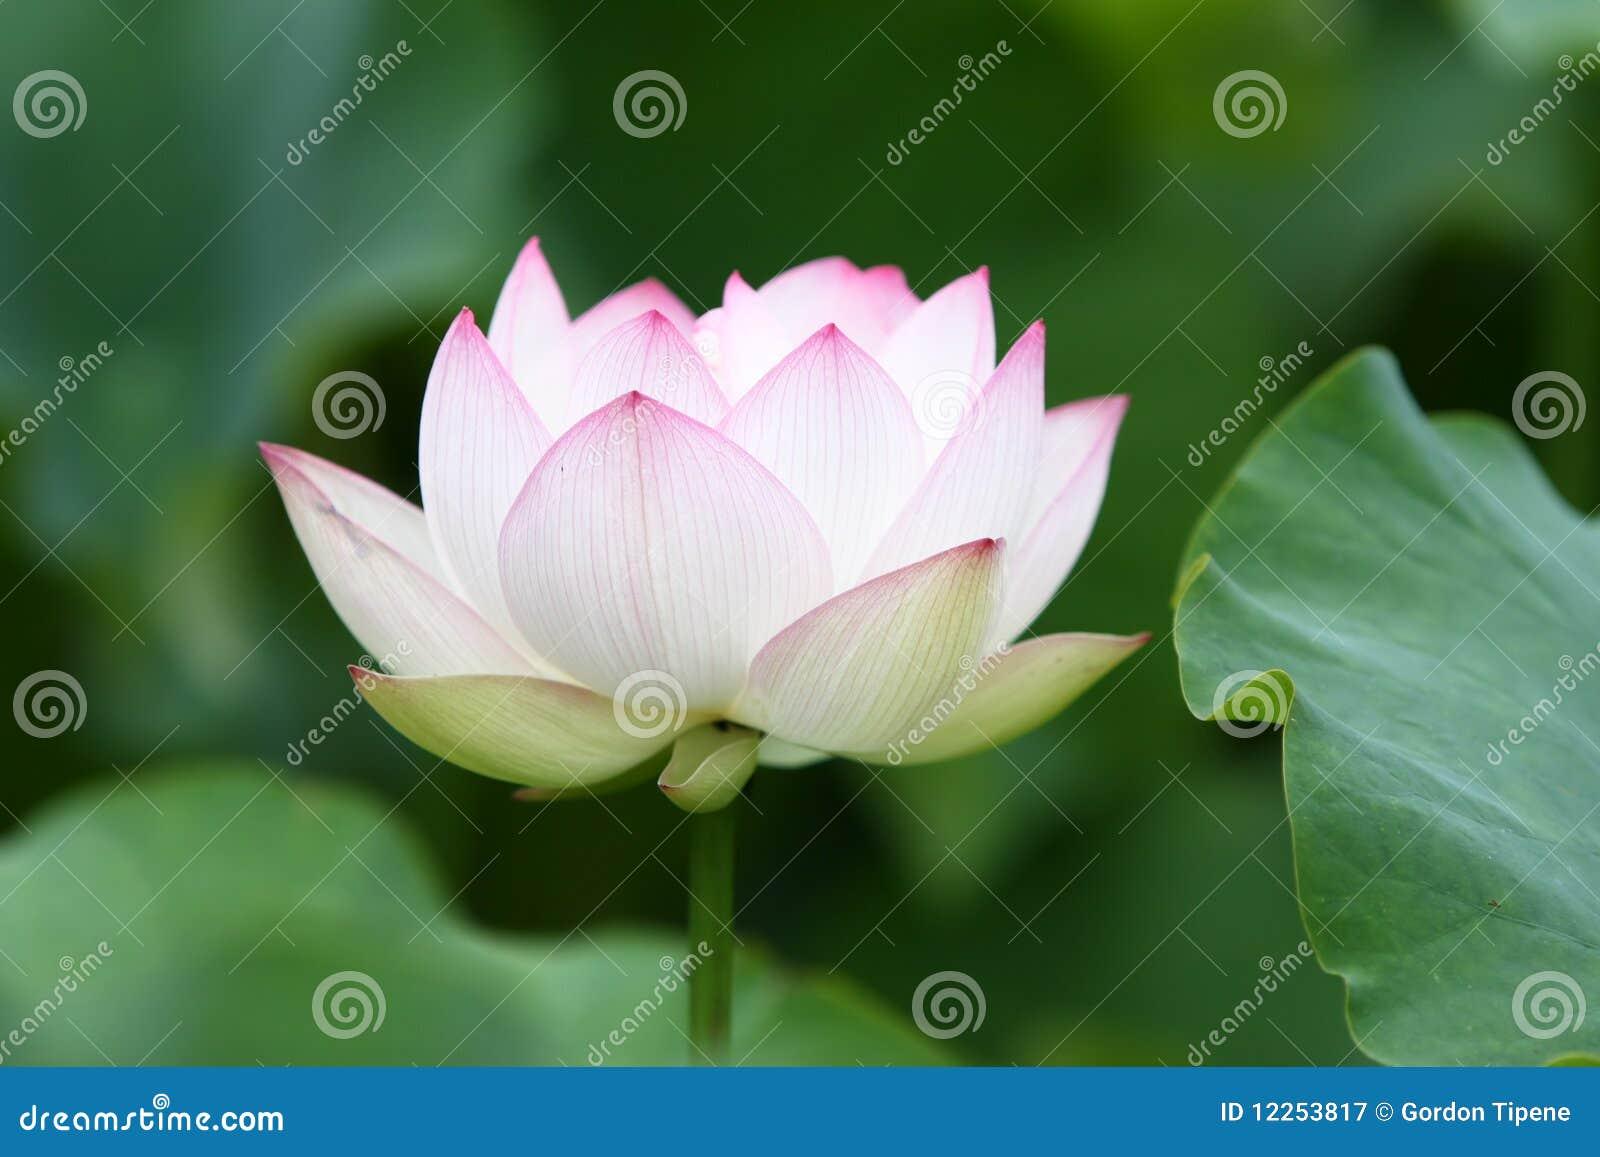 White lotus flower in full bloom stock image image of lily pink white lotus flower in full bloom izmirmasajfo